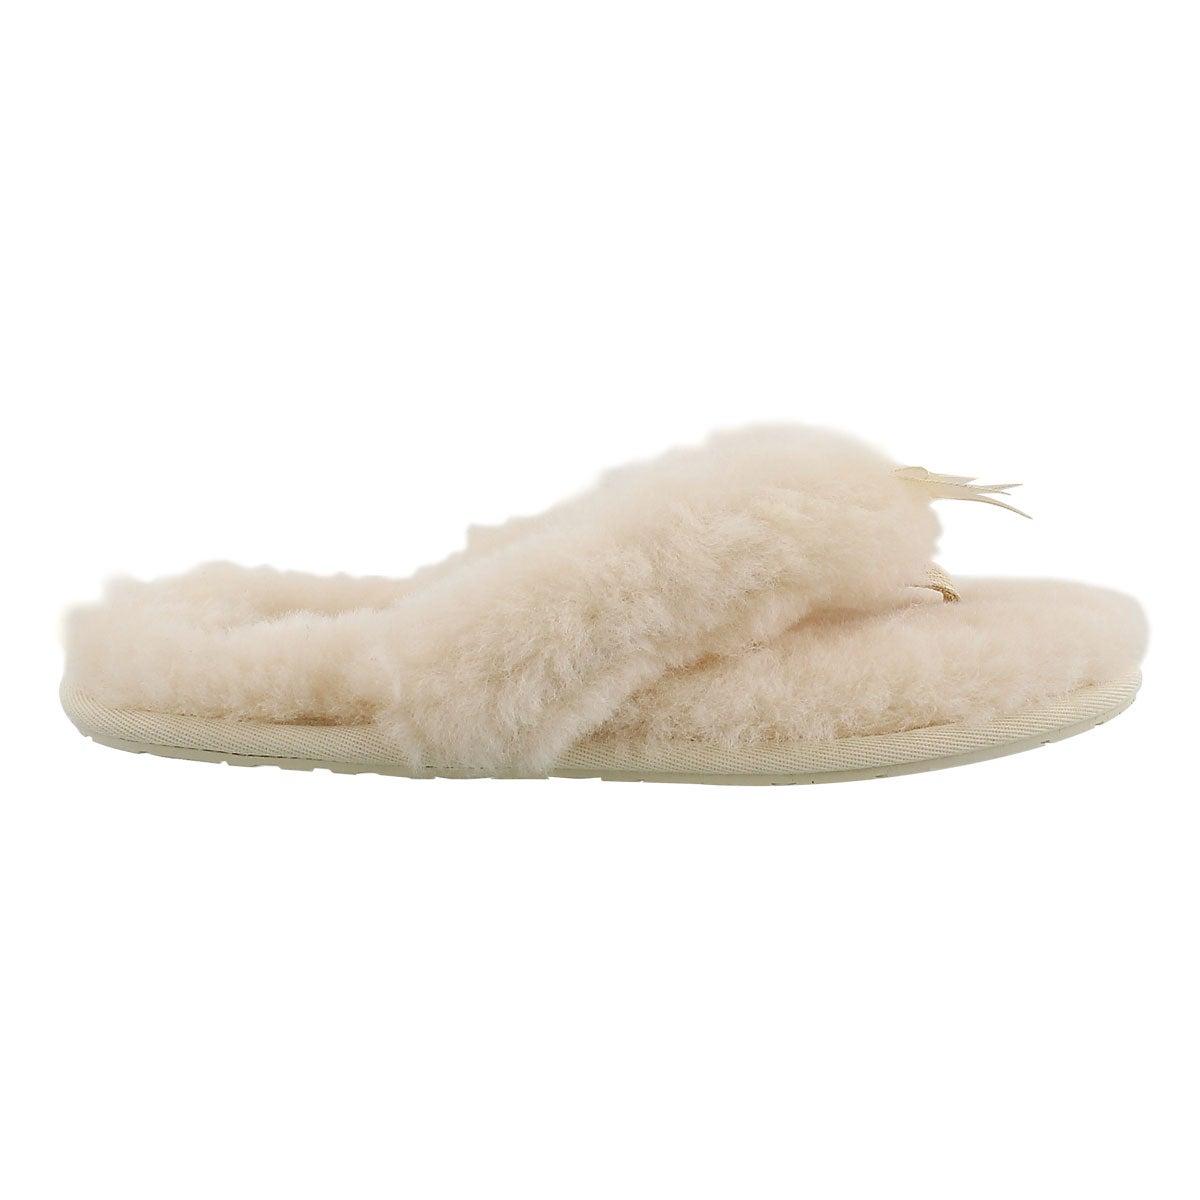 1dbb3fcbf4b Ugg Sheepskin Thong Slippers